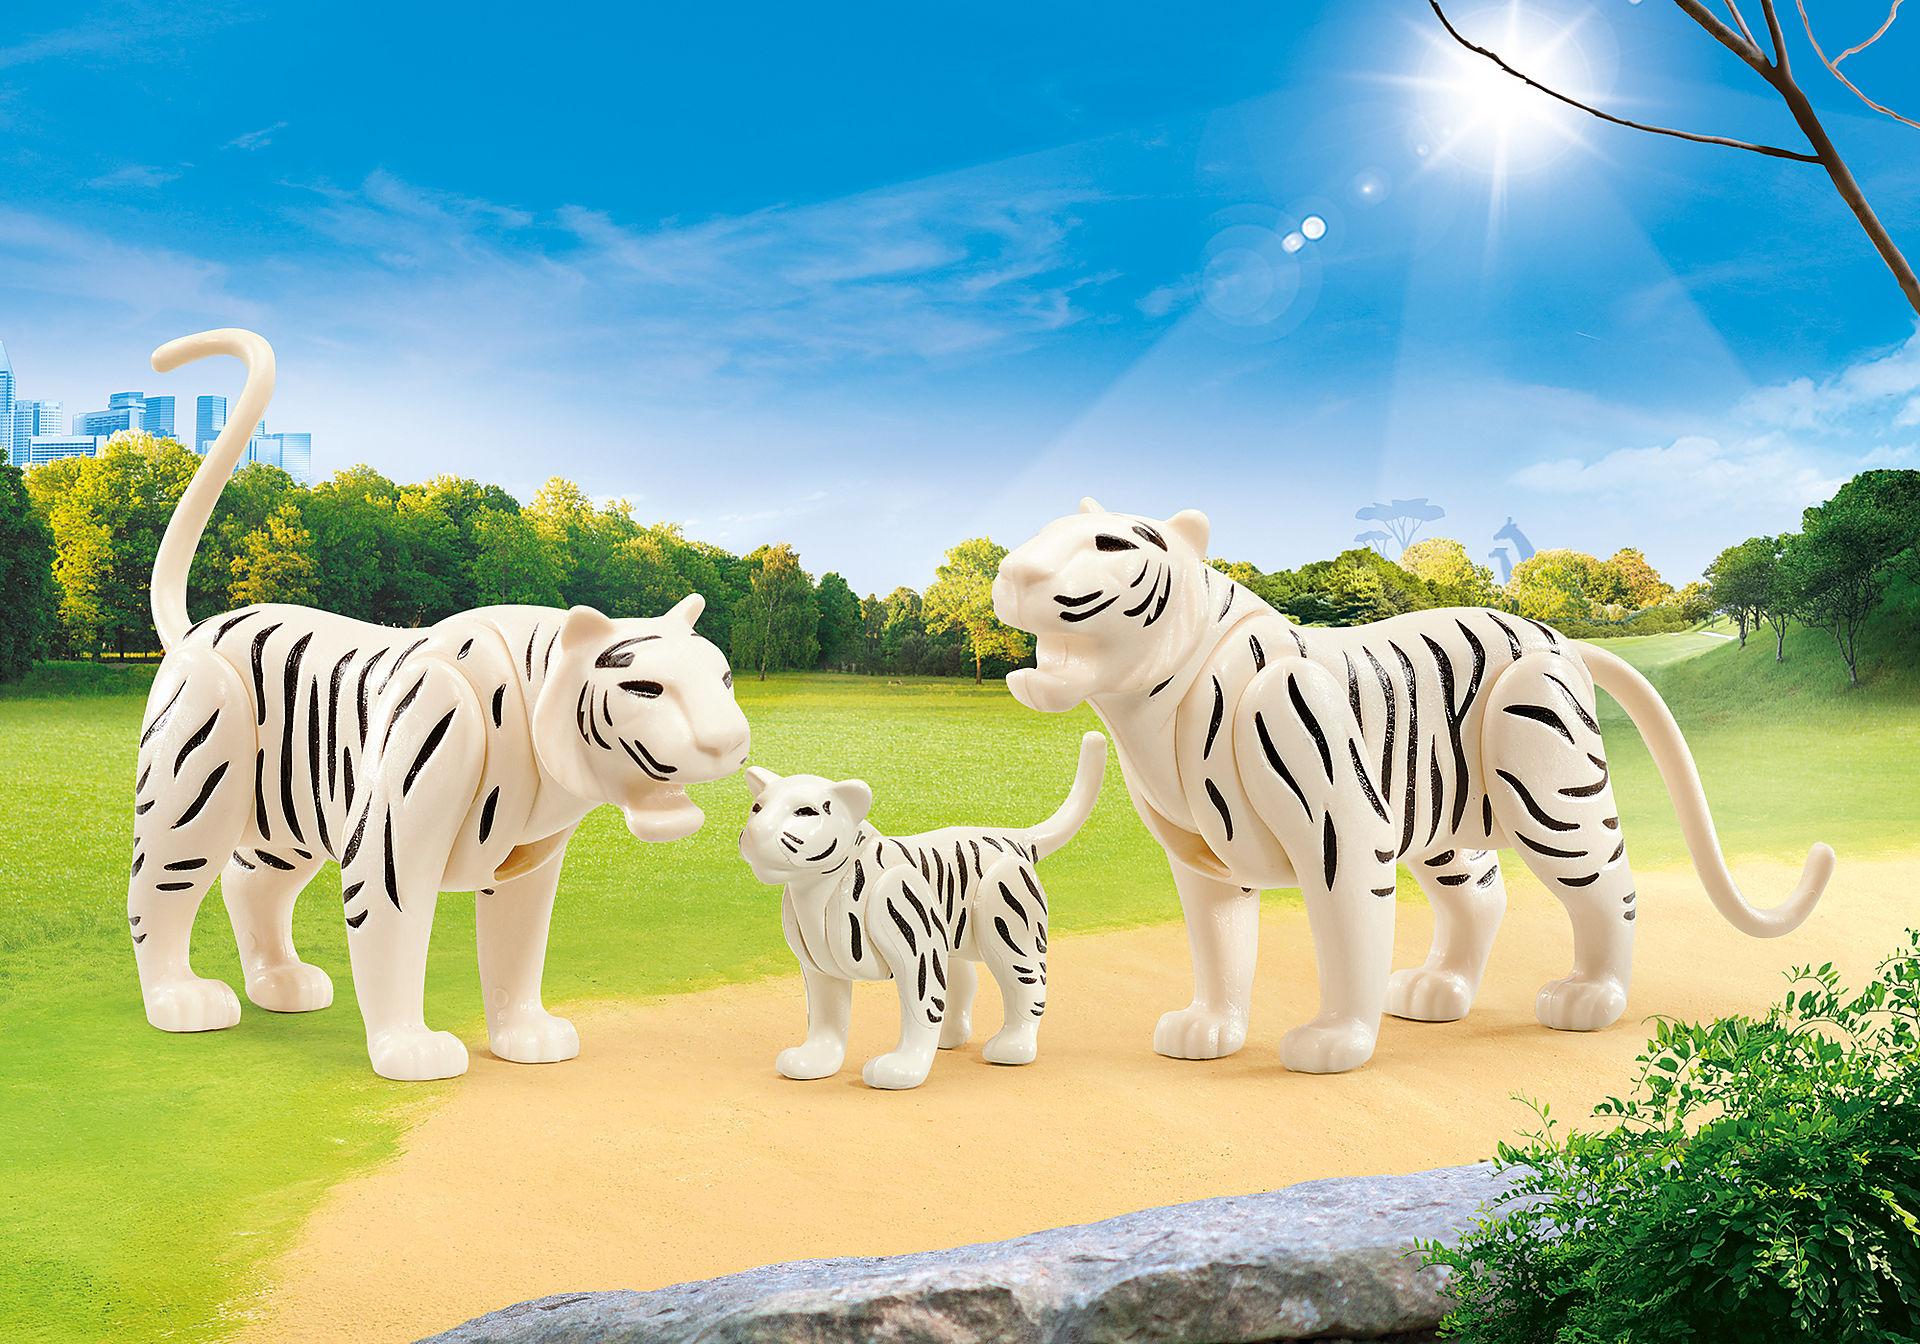 9872 Famille de tigres blancs  zoom image1